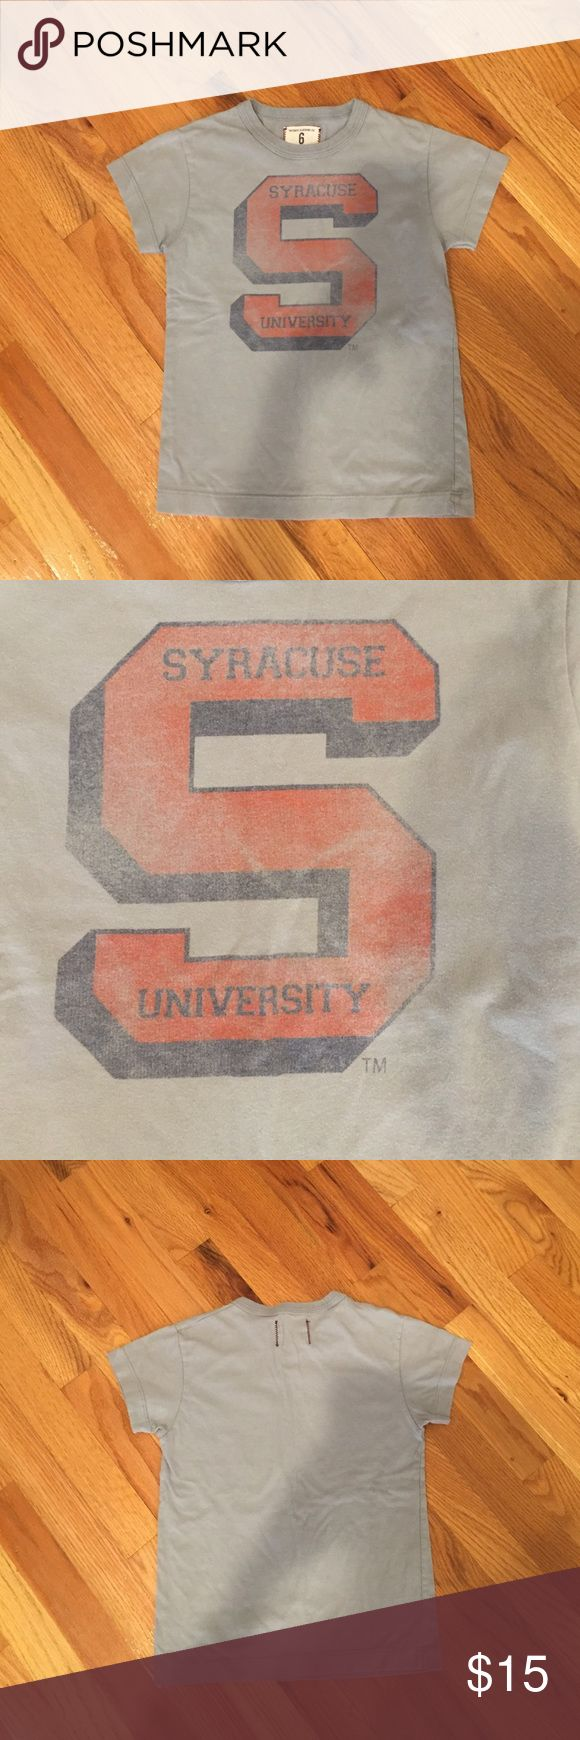 Tailgate Clothing Syracuse tee Gray worn in look tshirt Tailgate Clothing Shirts & Tops Tees - Short Sleeve